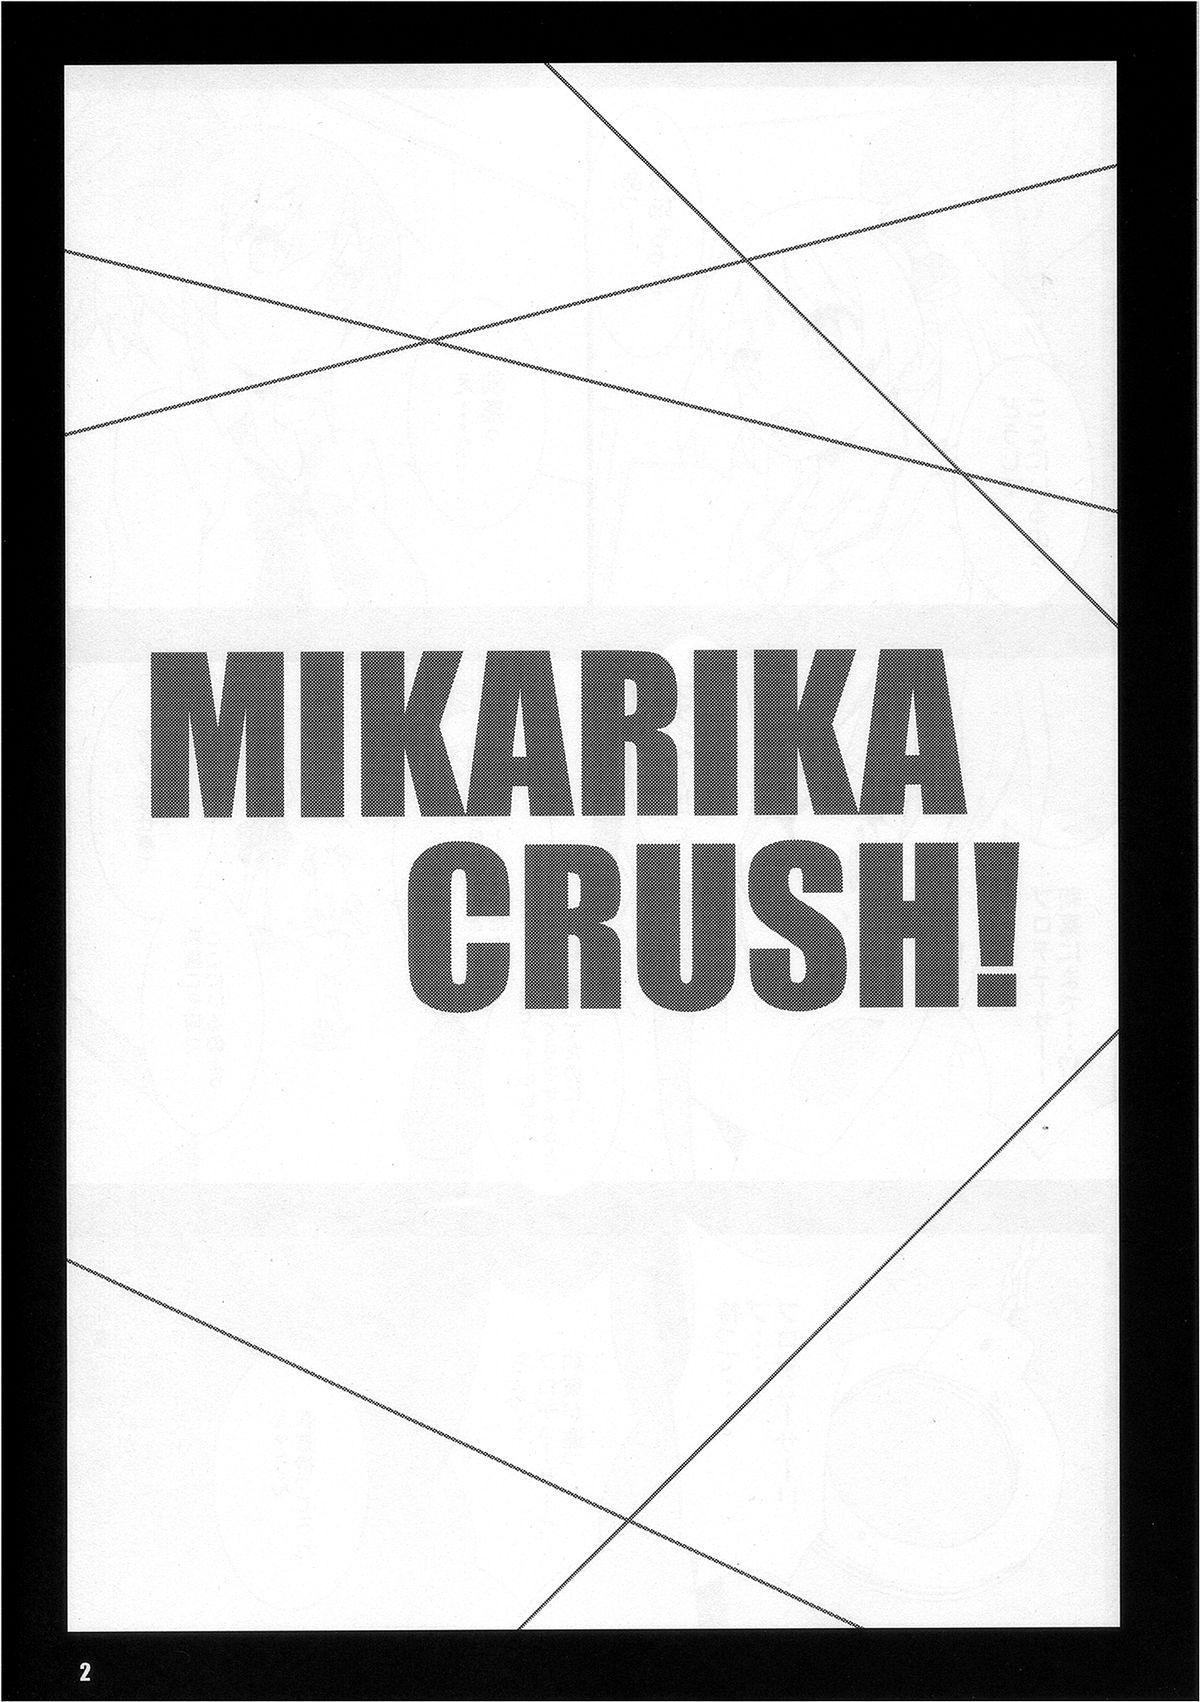 MIKARIKA CRUSH! 2